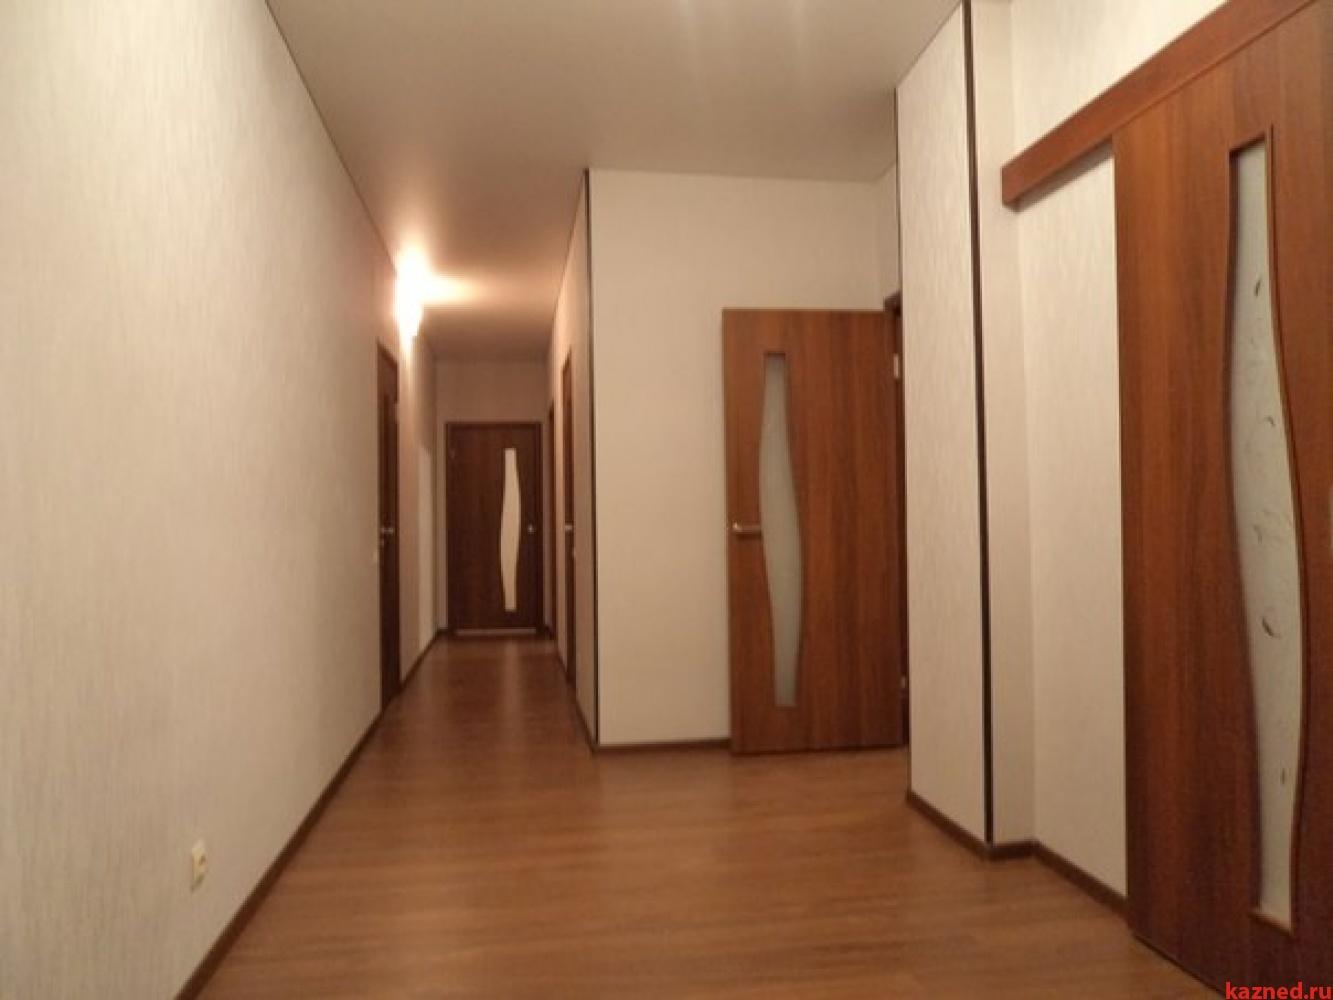 Продажа 3-к квартиры Баки Урманче, 7, 82 м2  (миниатюра №1)